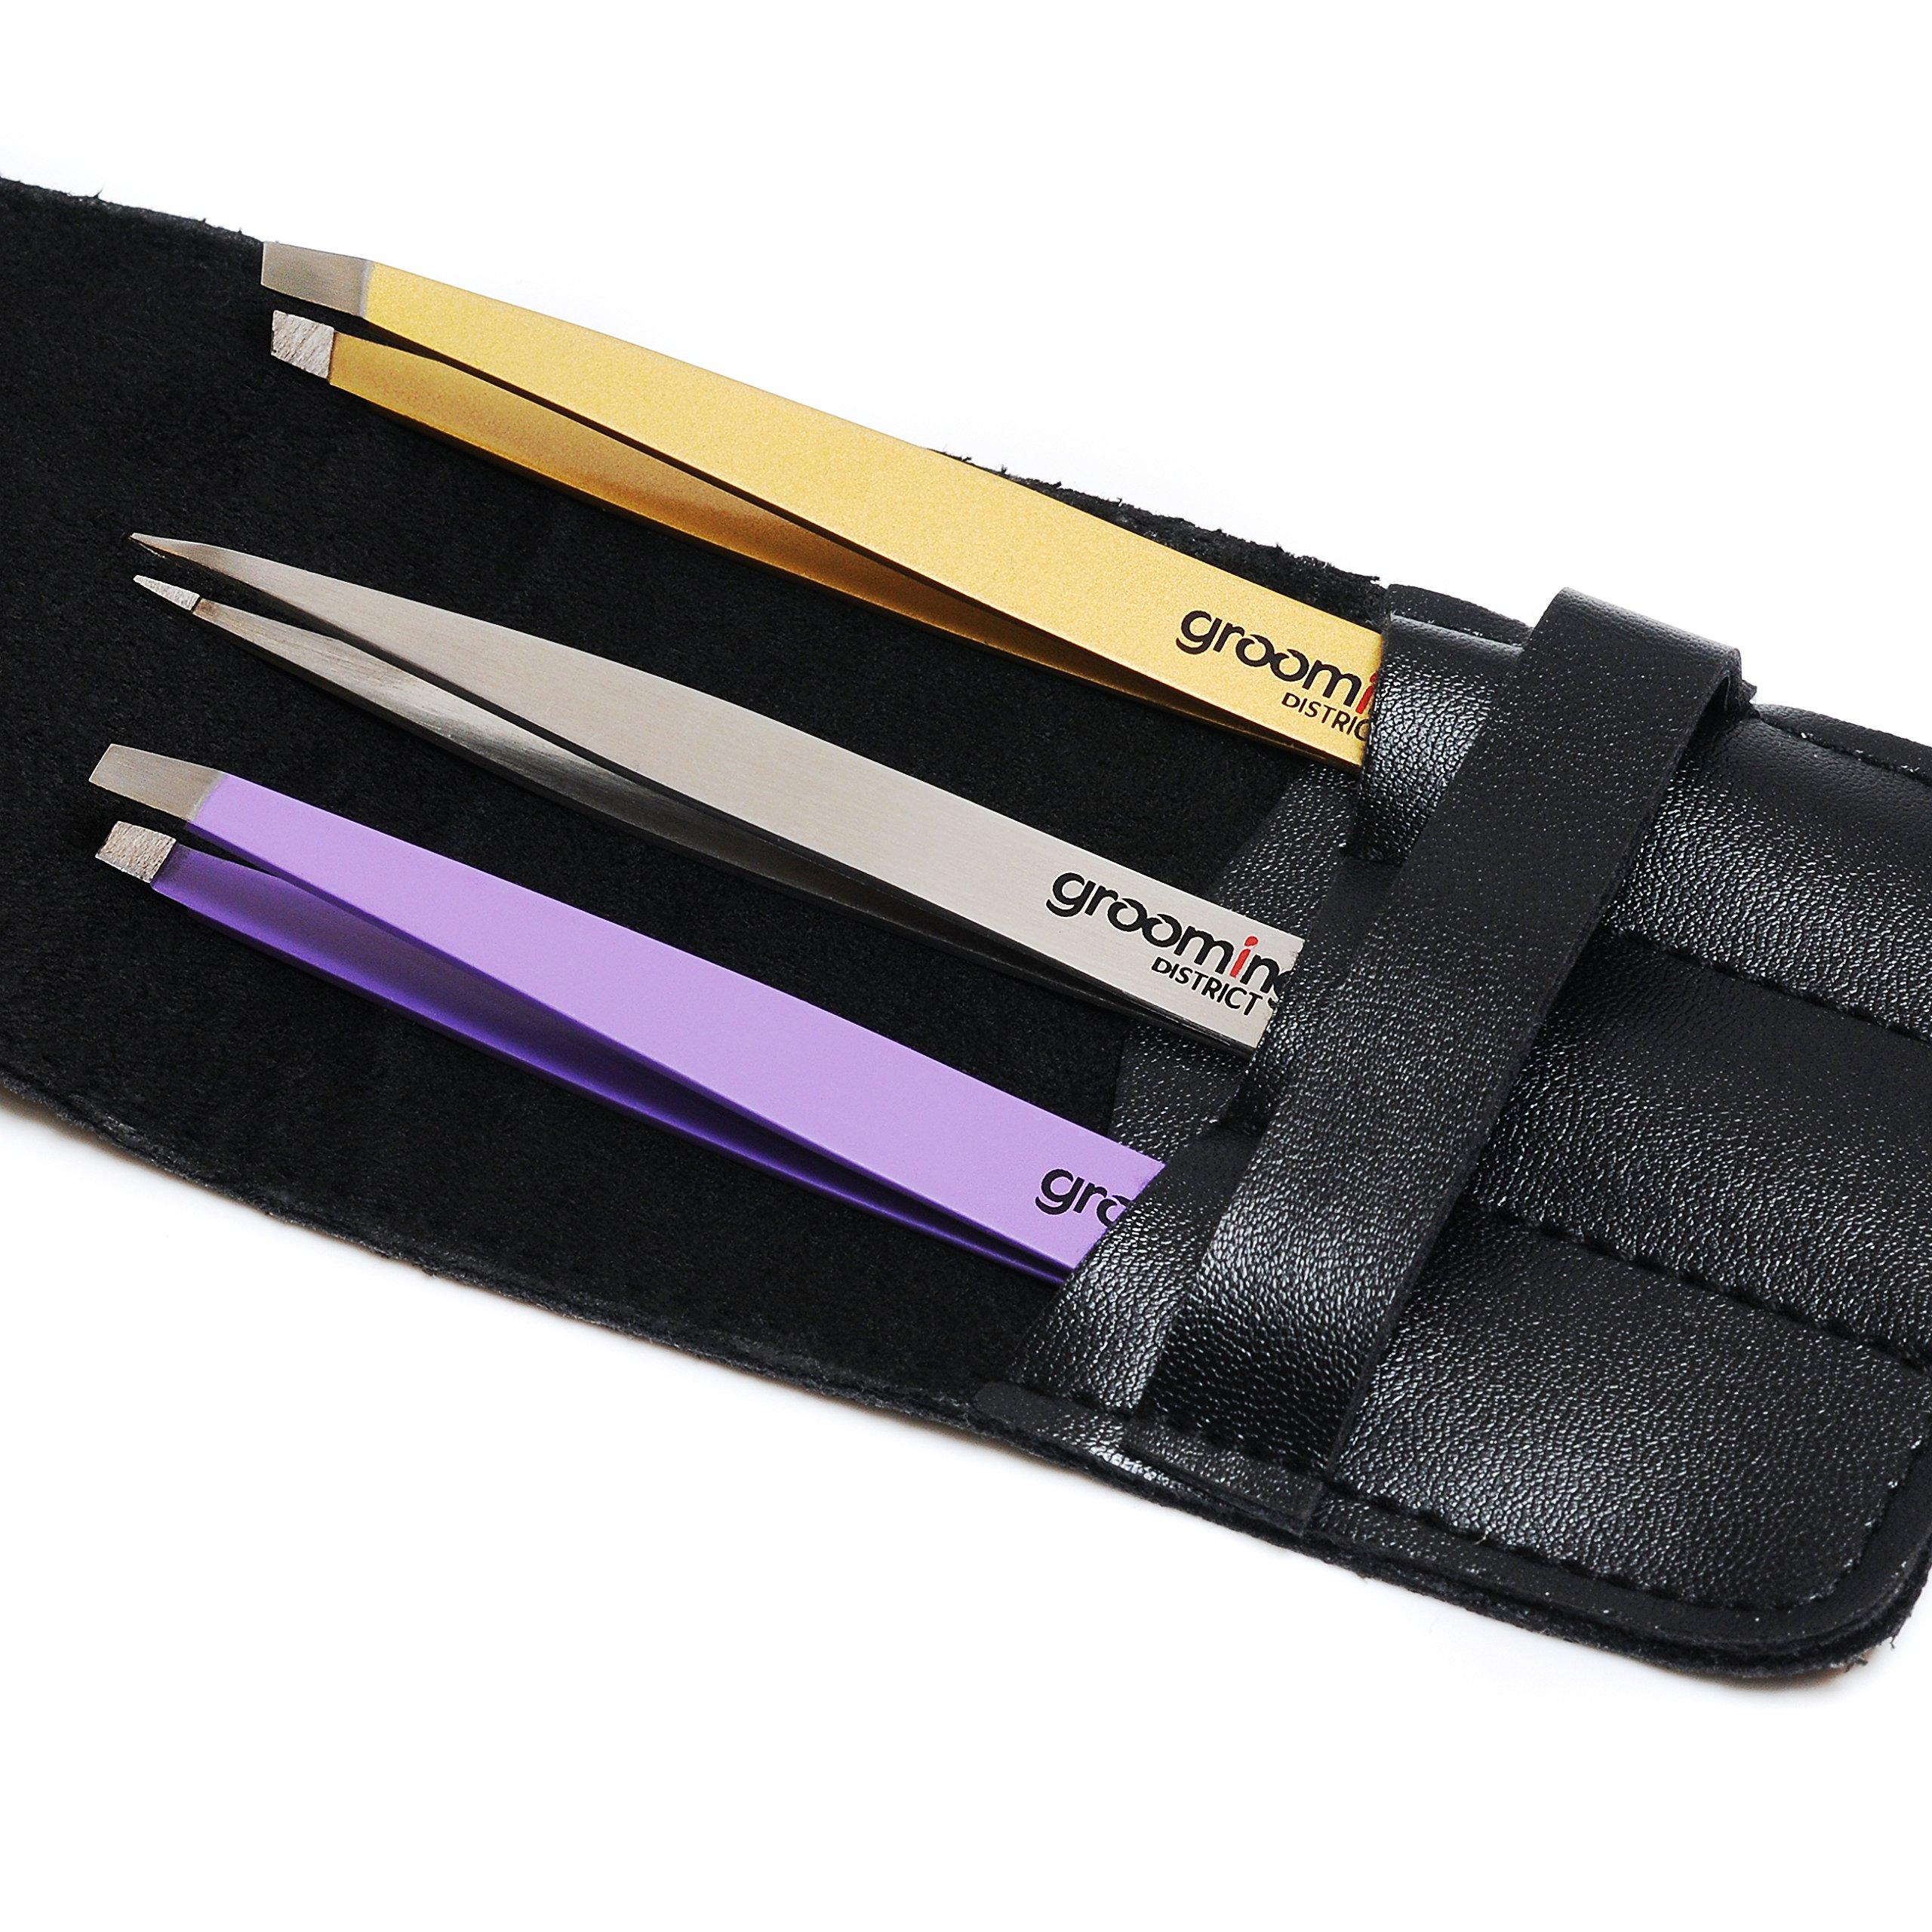 Grooming District Premium 3 Tip Tweezers Set with Case | Slant, Straight and Pointed Tip Stainless Steel Tweezer